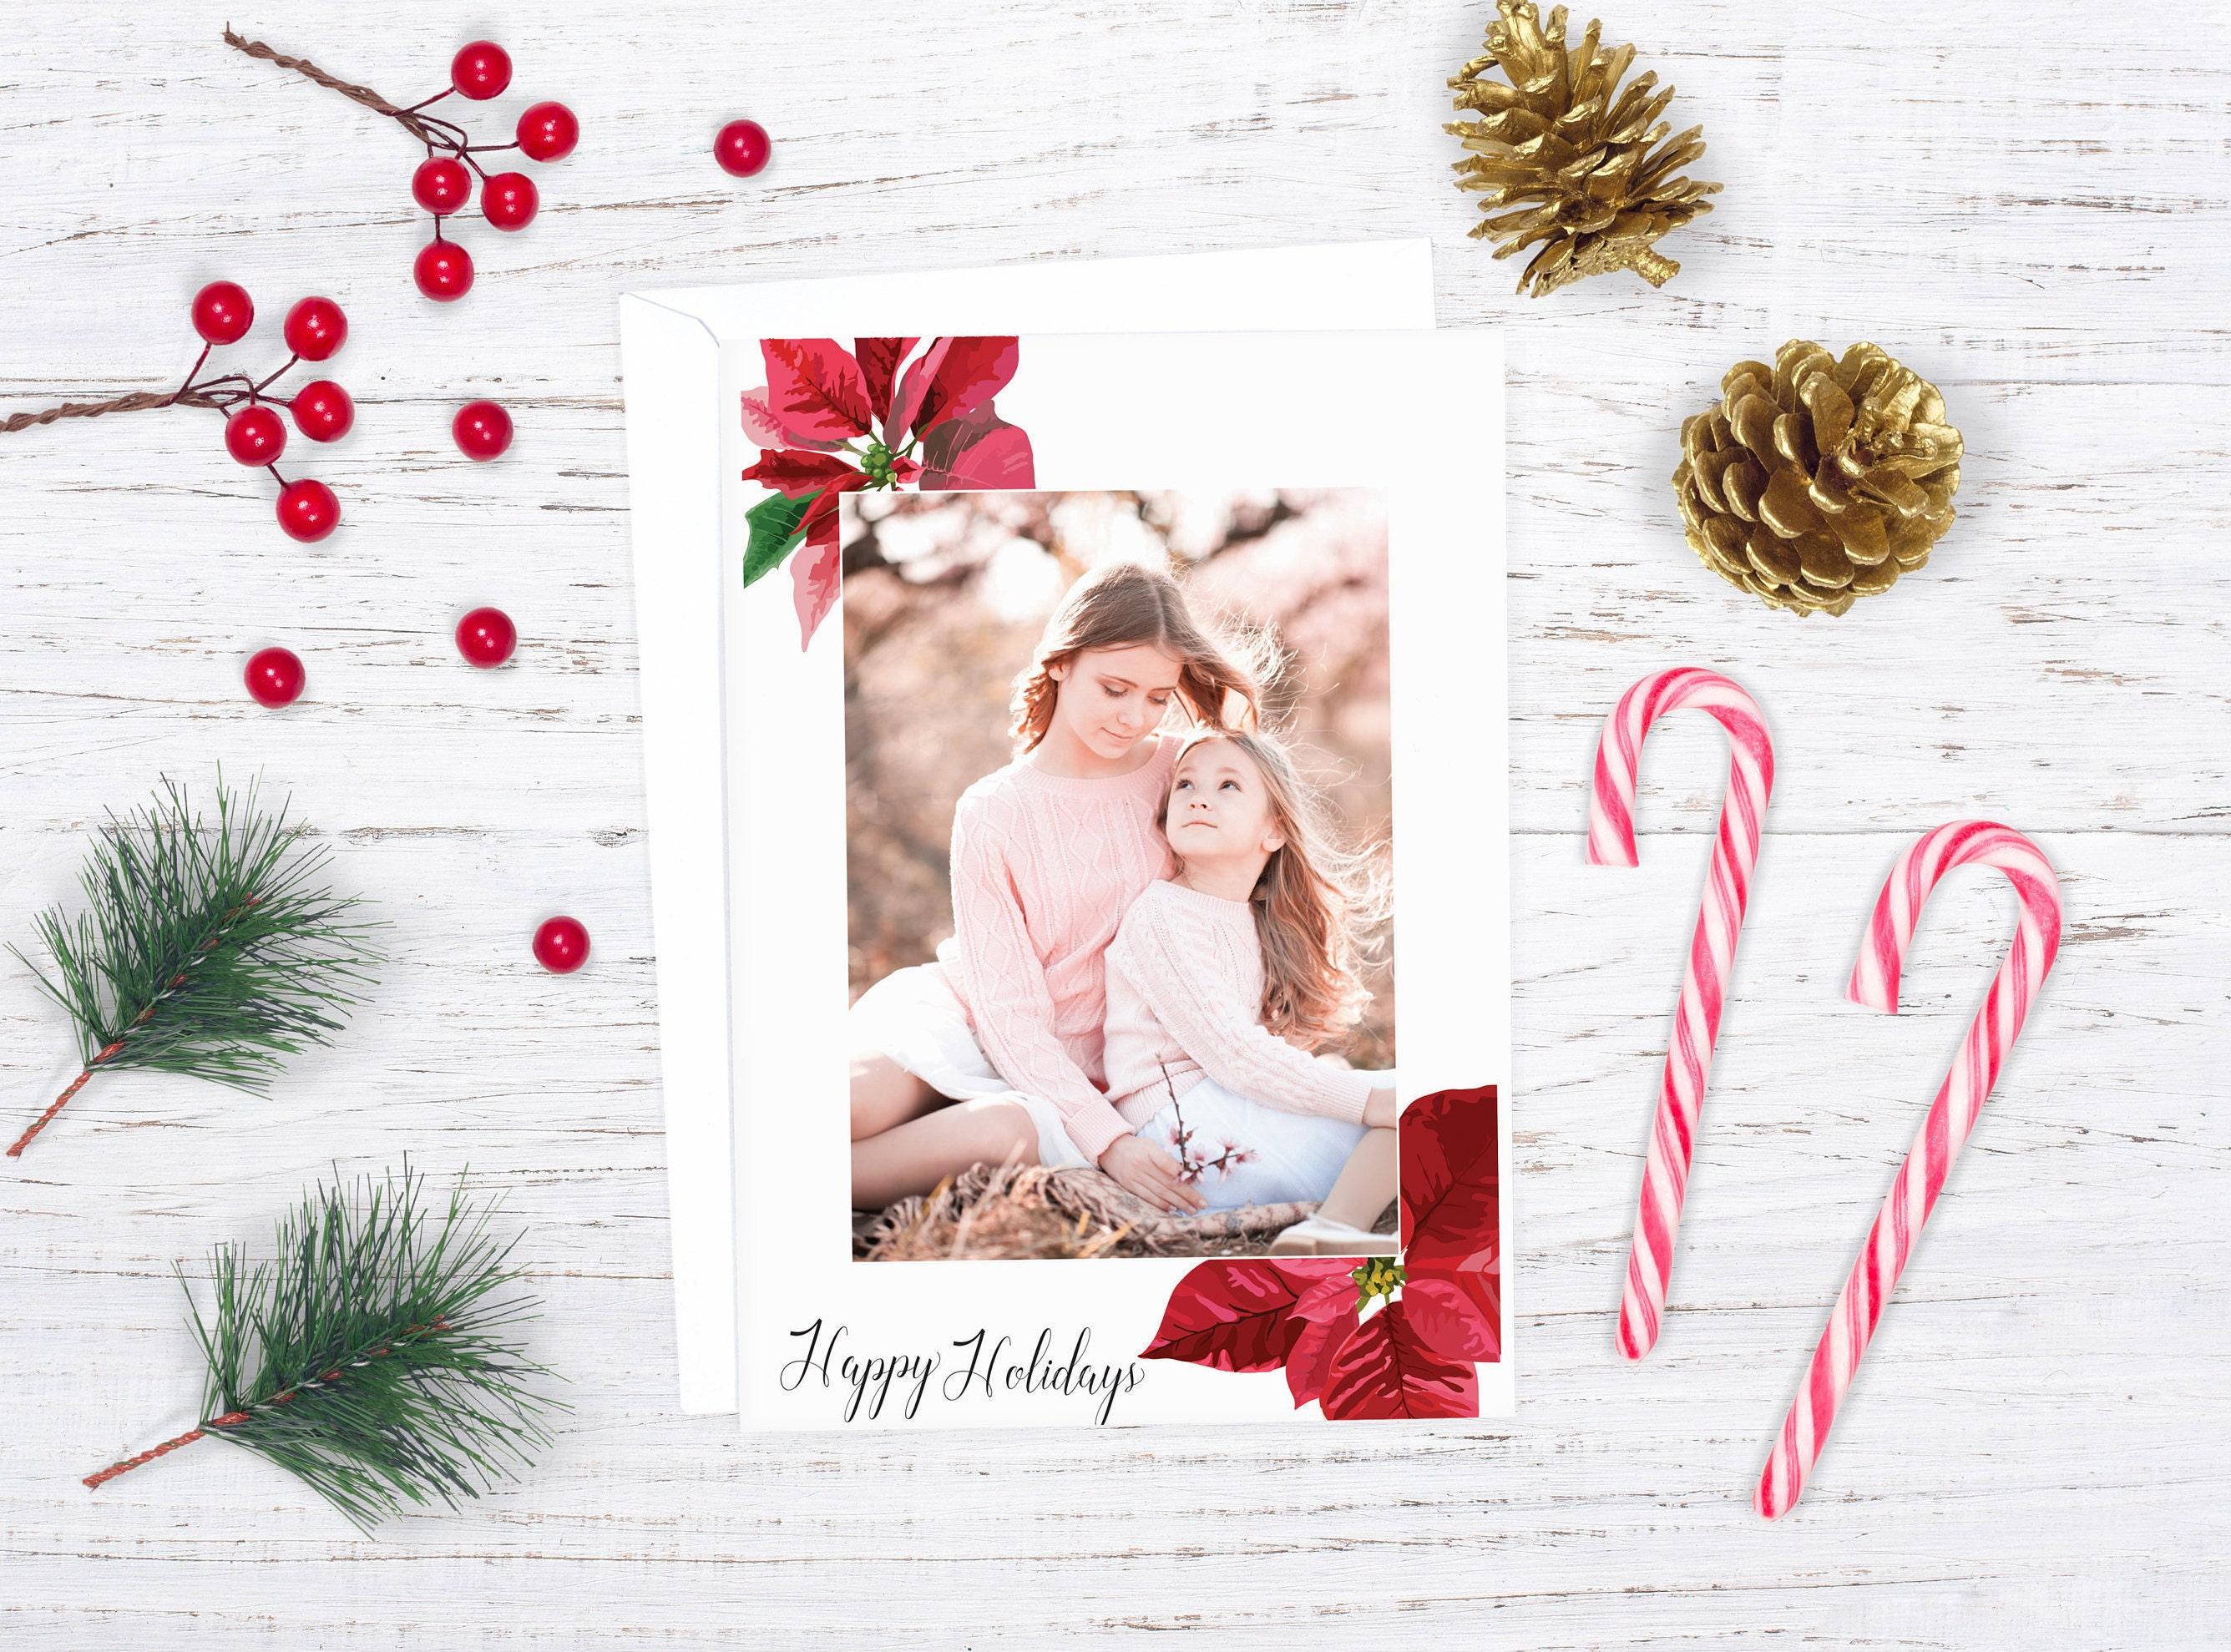 Happy holidays photo card family christmas card photo holiday card happy holidays photo card family christmas card photo holiday card client christmas card m4hsunfo